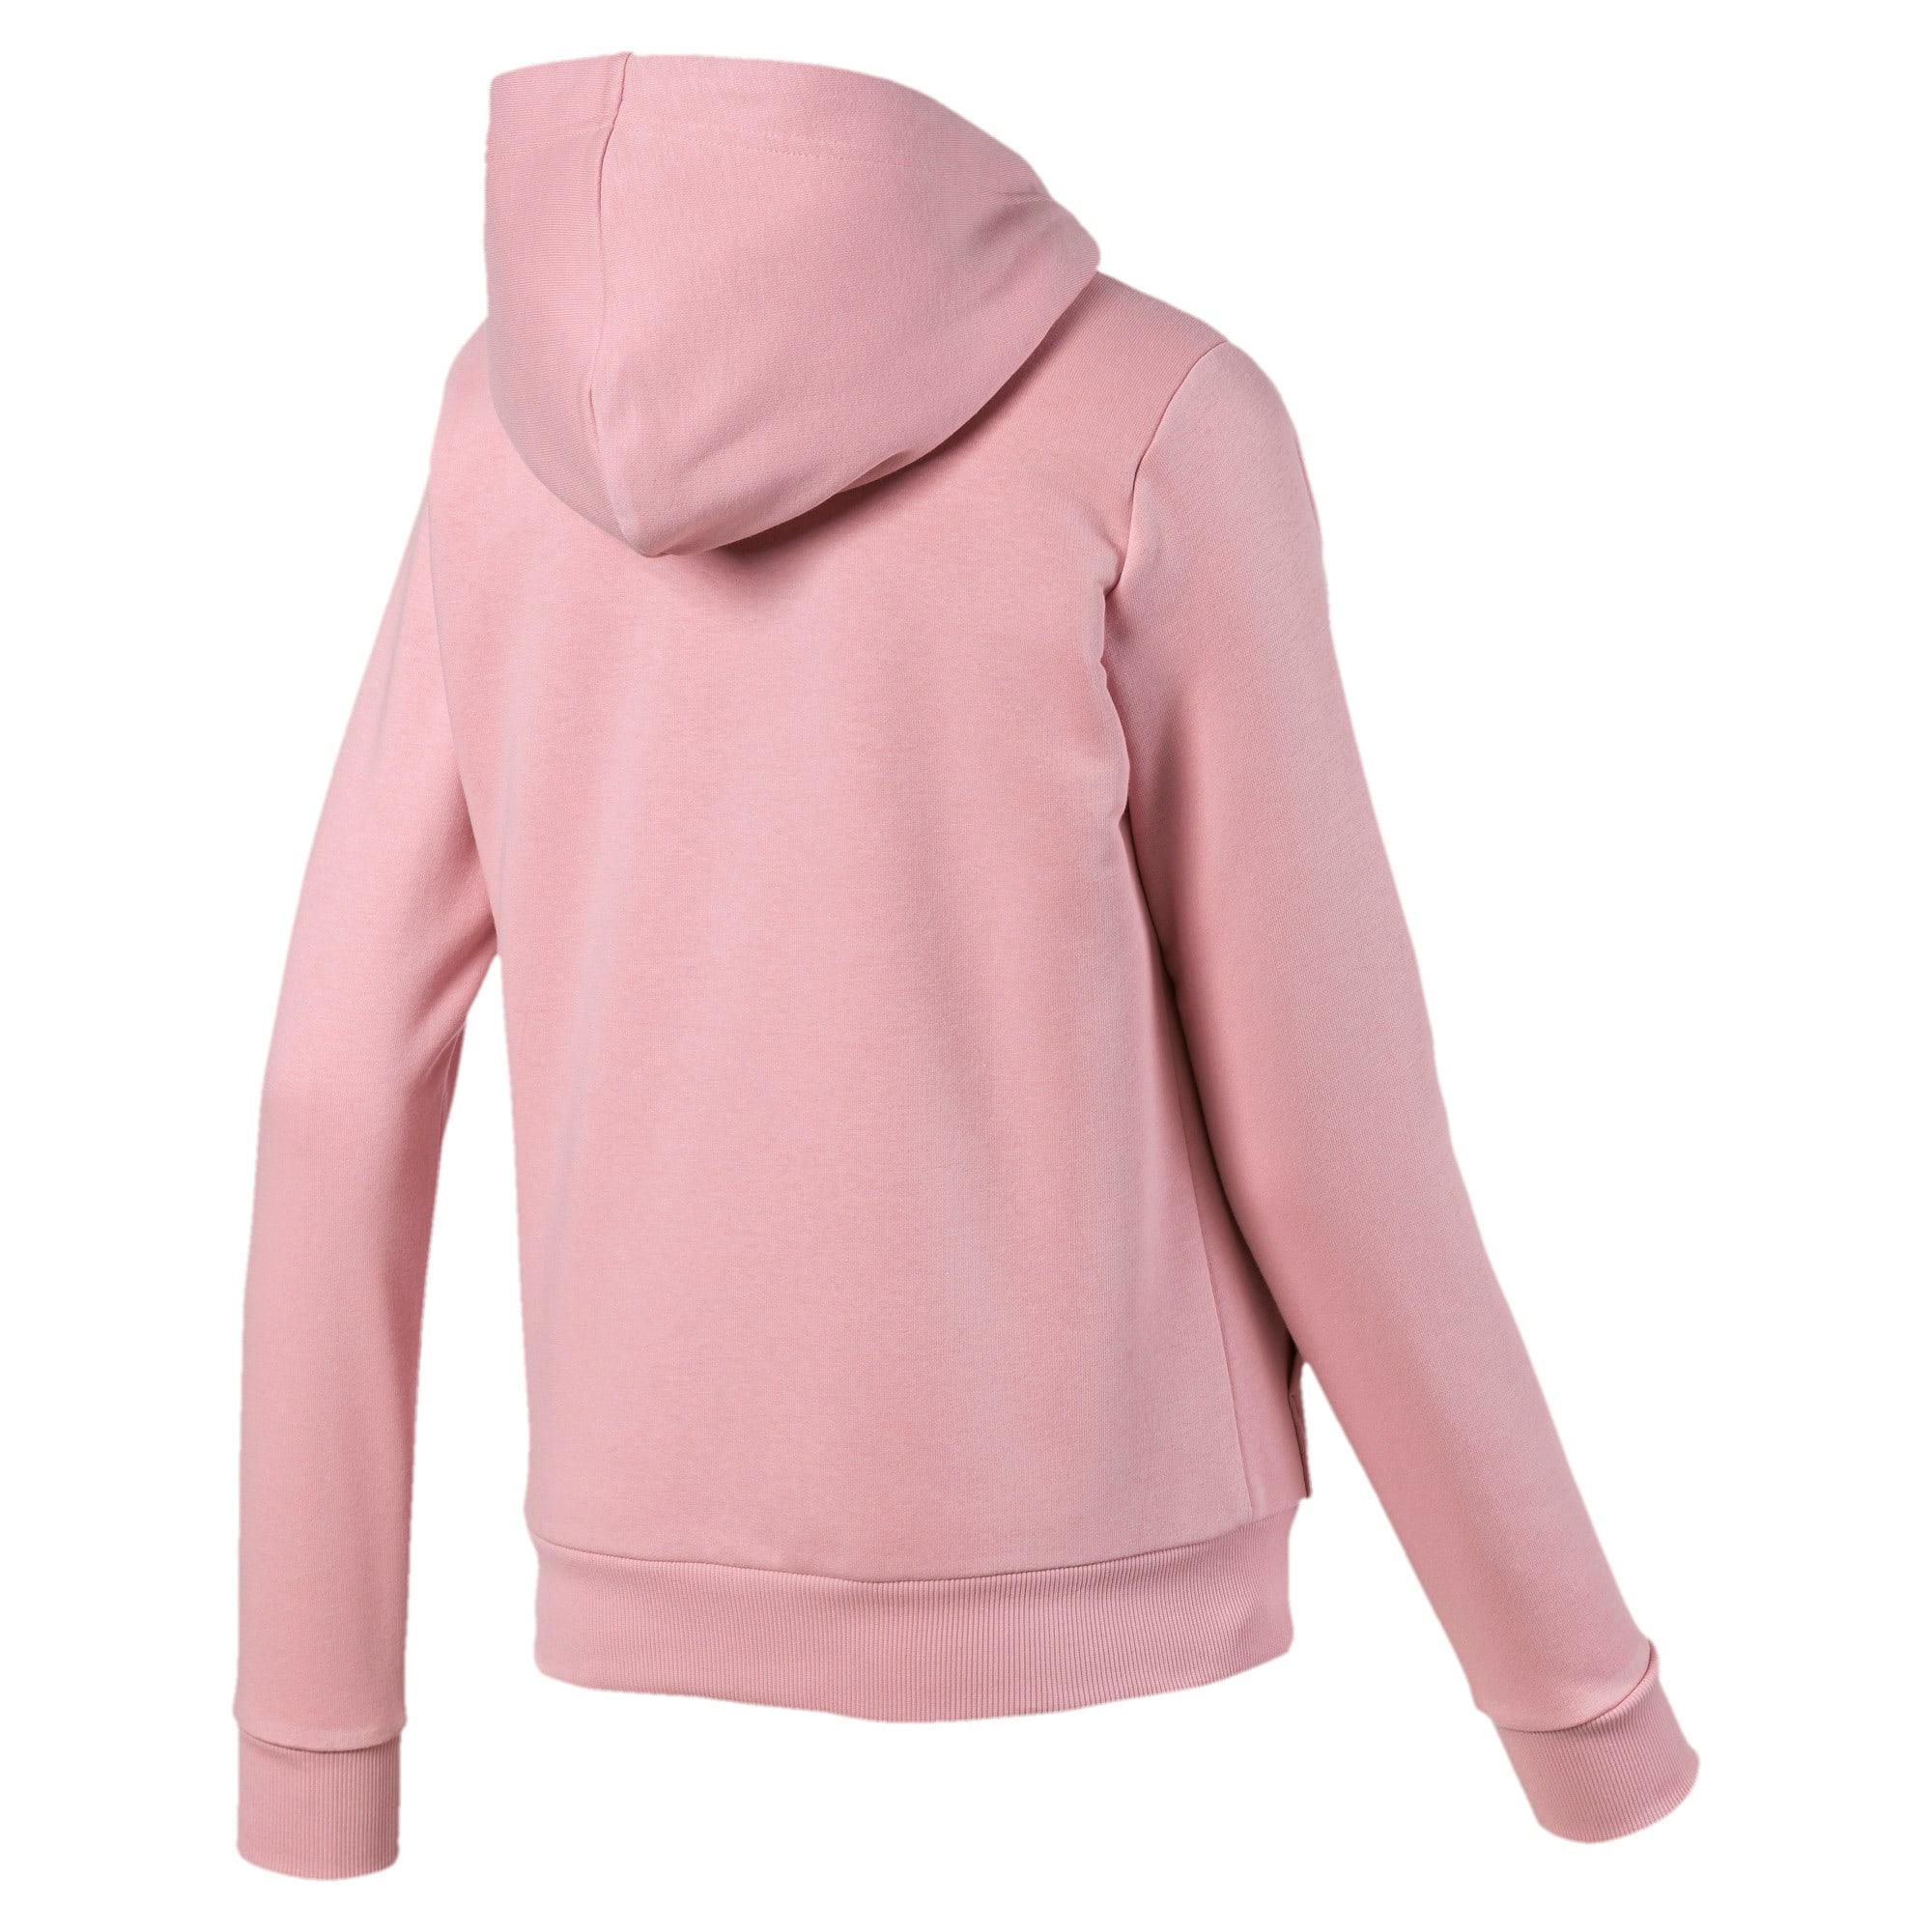 Thumbnail 5 of Essentials Sherpa Hooded Women's Jacket, Bridal Rose, medium